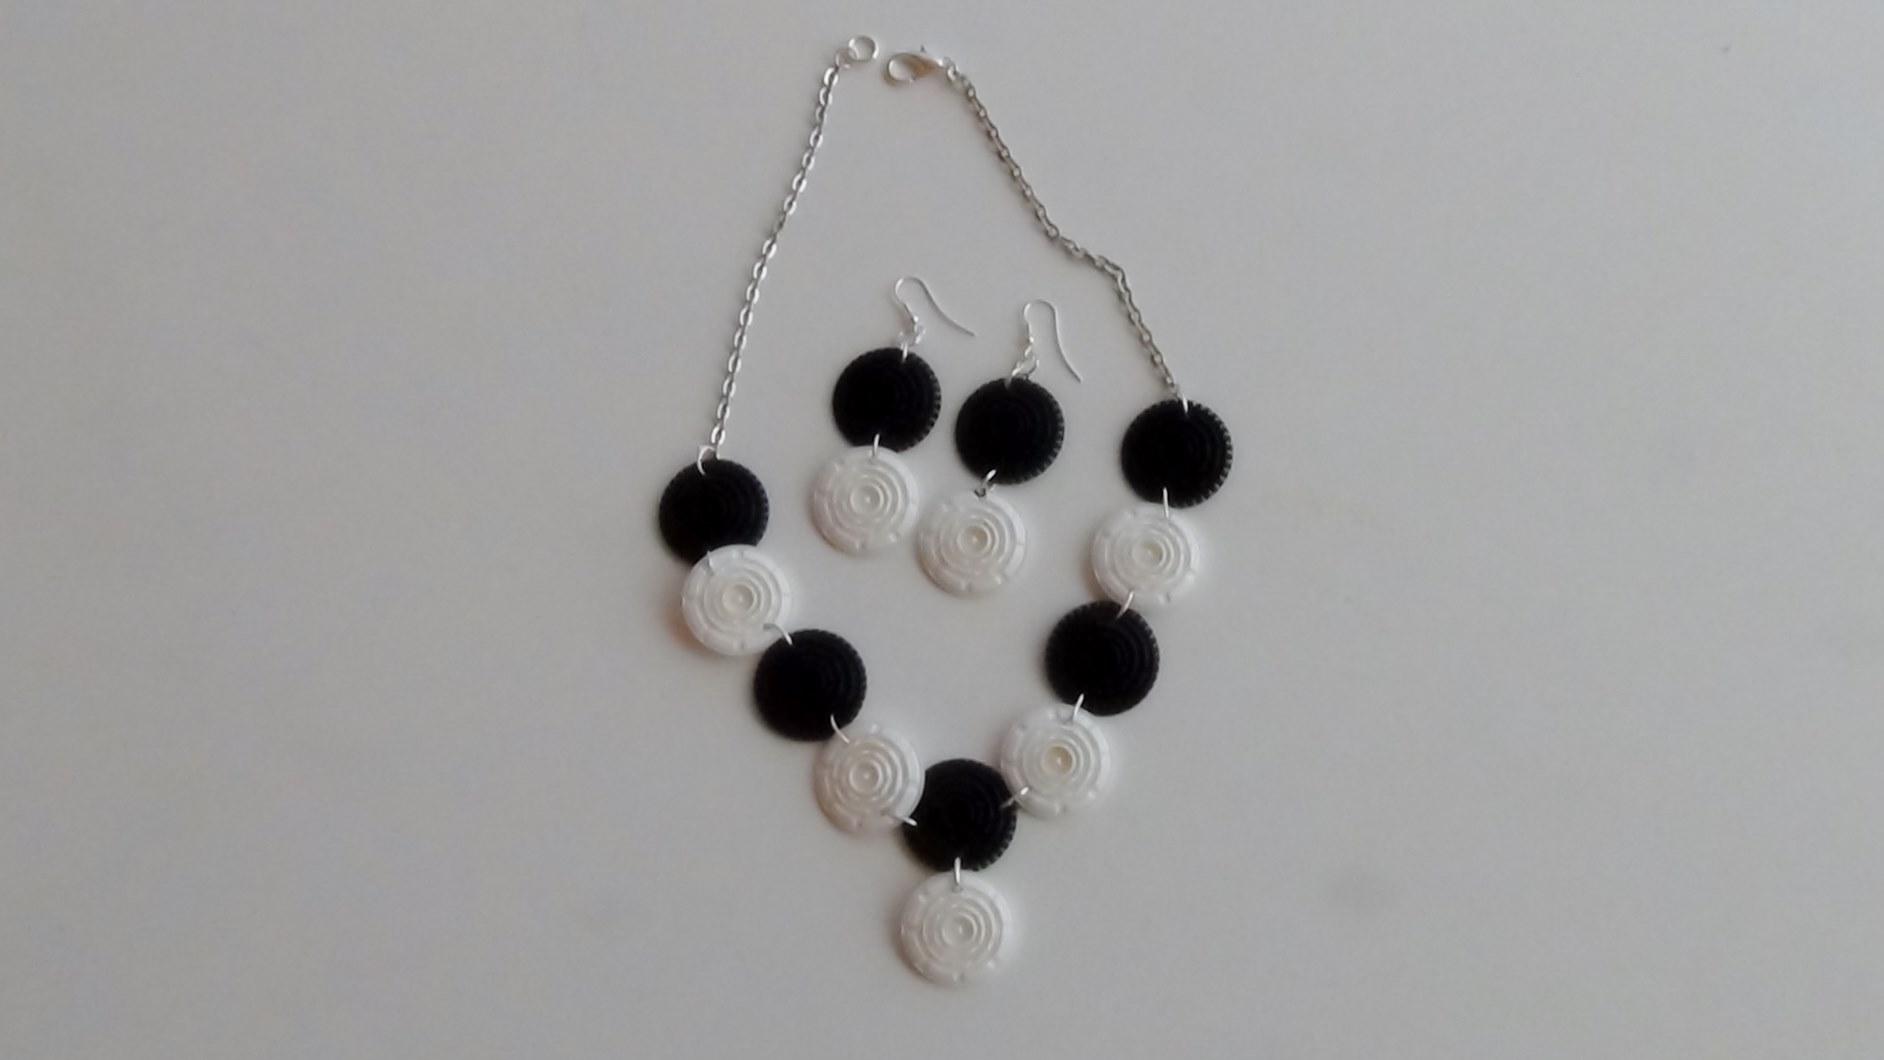 Collar y pendientes realizados con filtros de cápsulas de café Dolce Gusto - Black and white earrings and collant